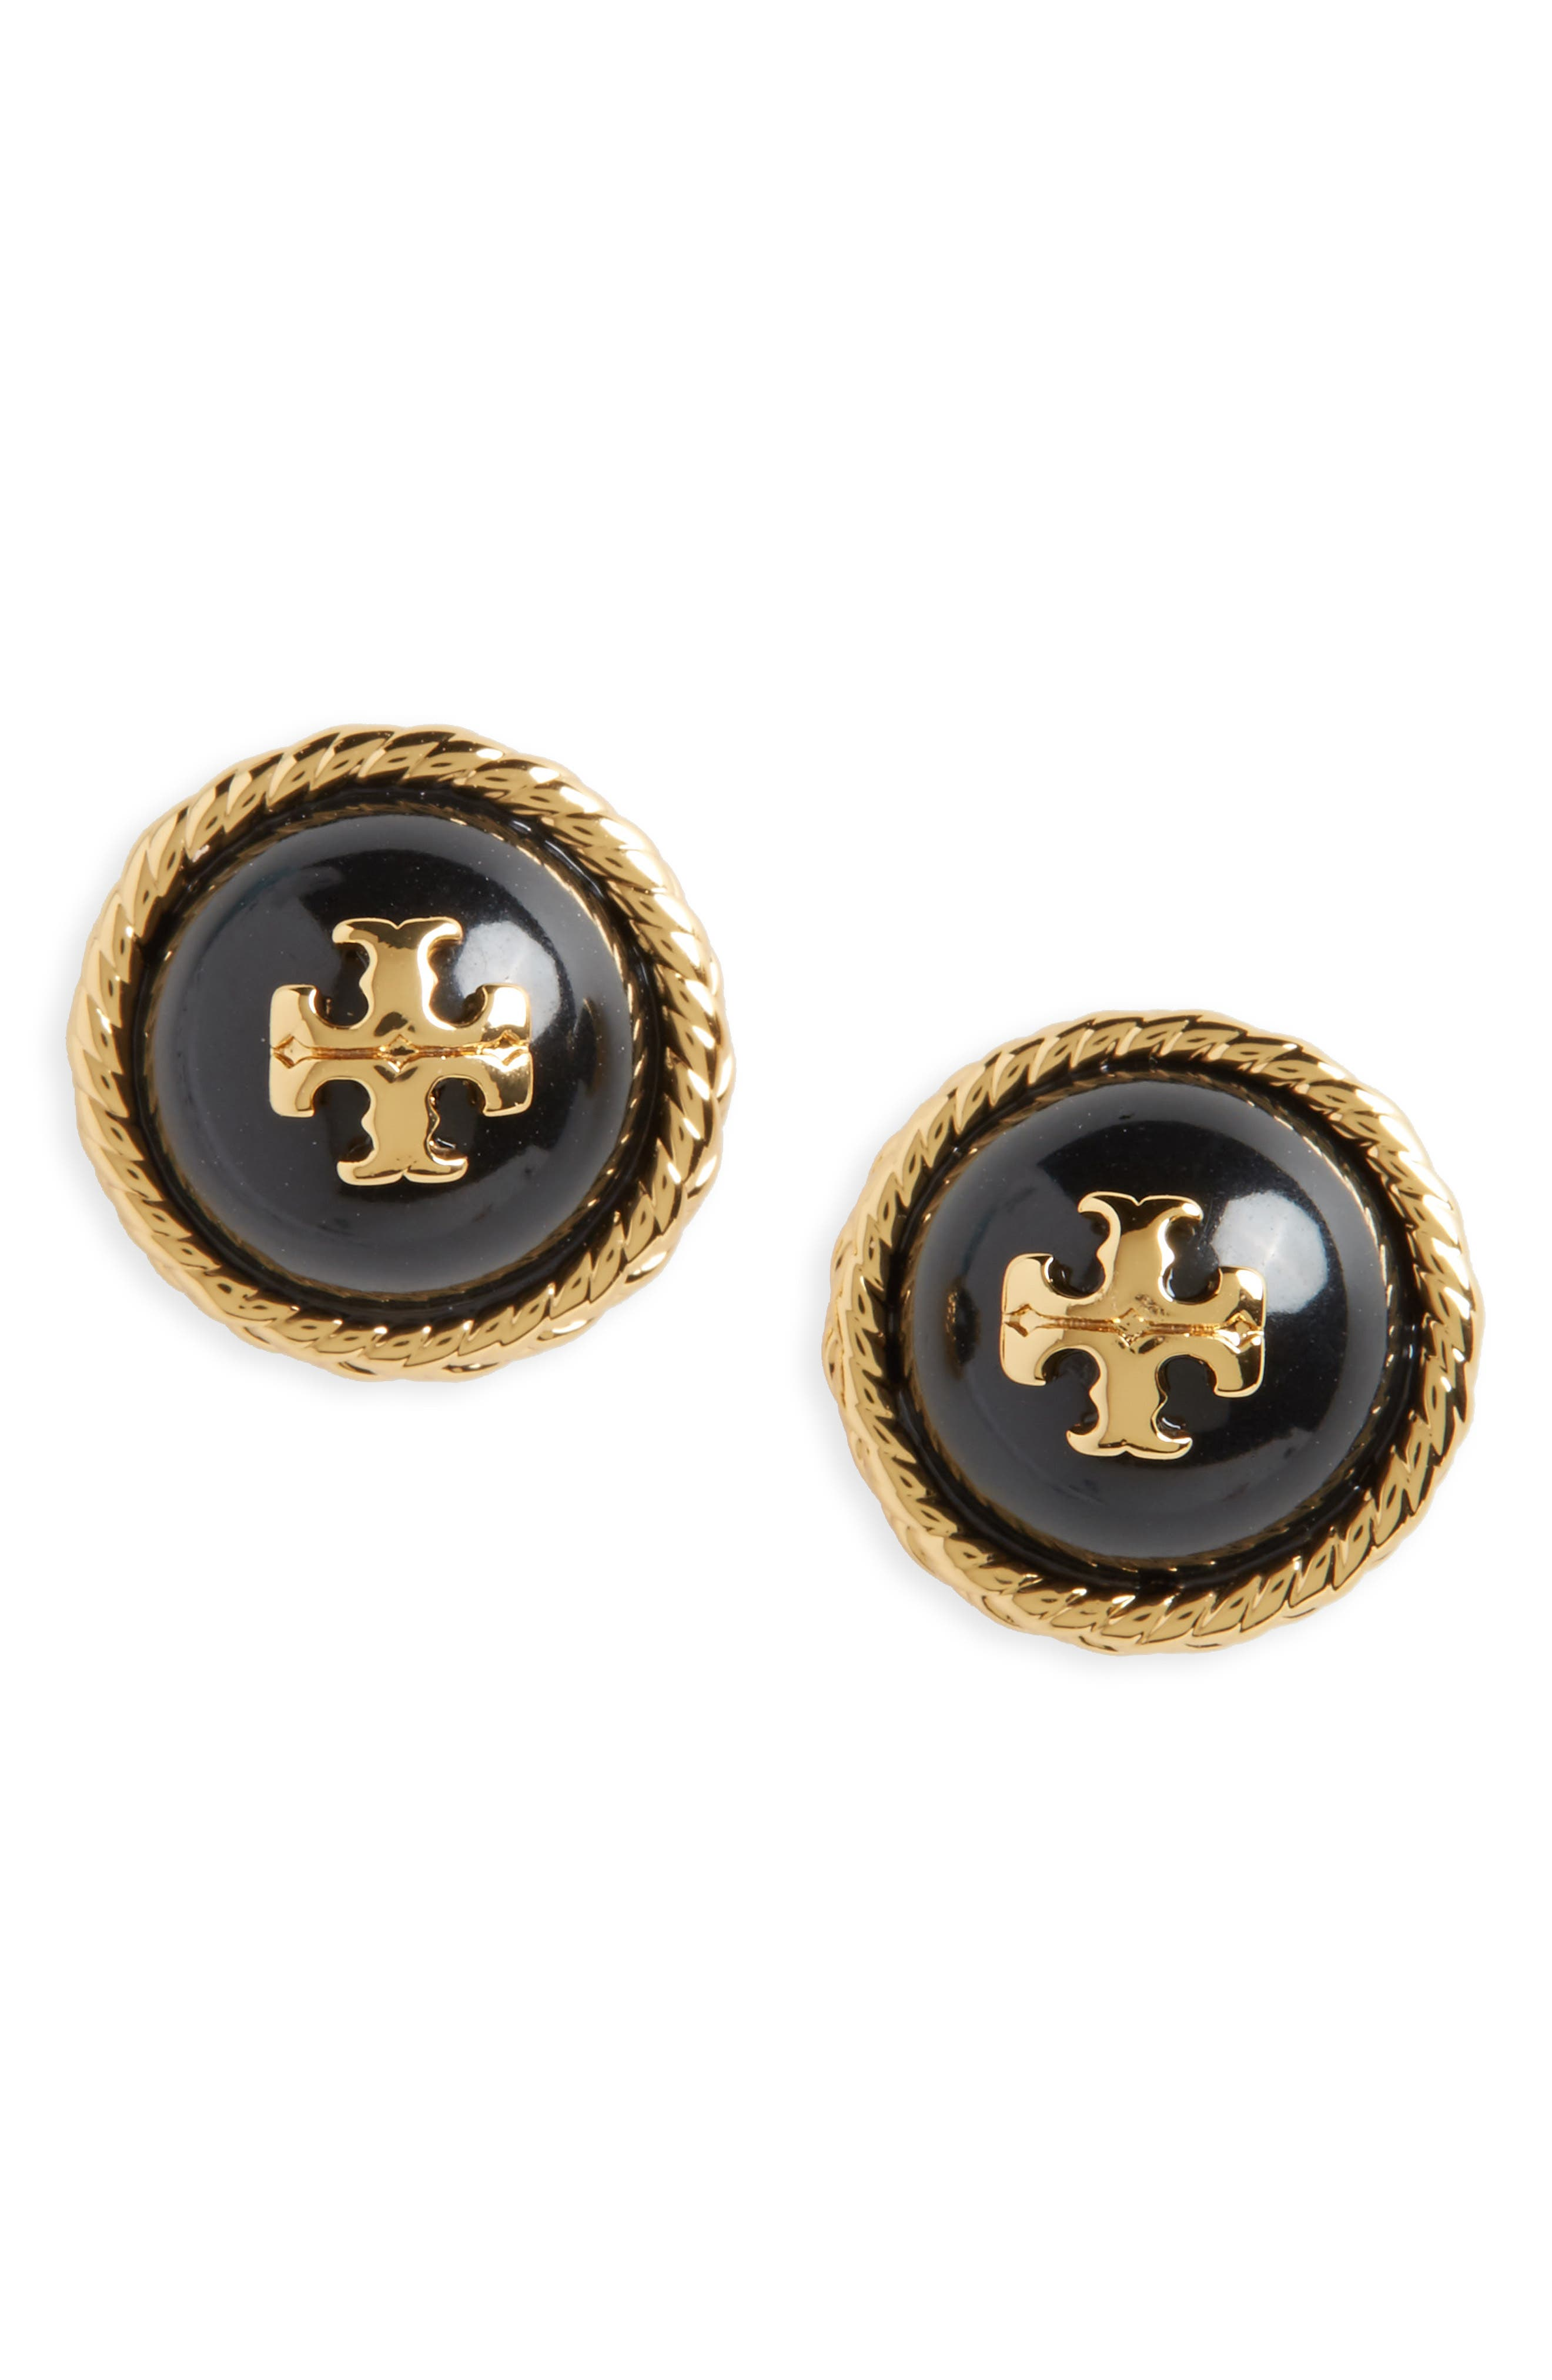 Main Image - Tory Burch Rope Stud Earrings